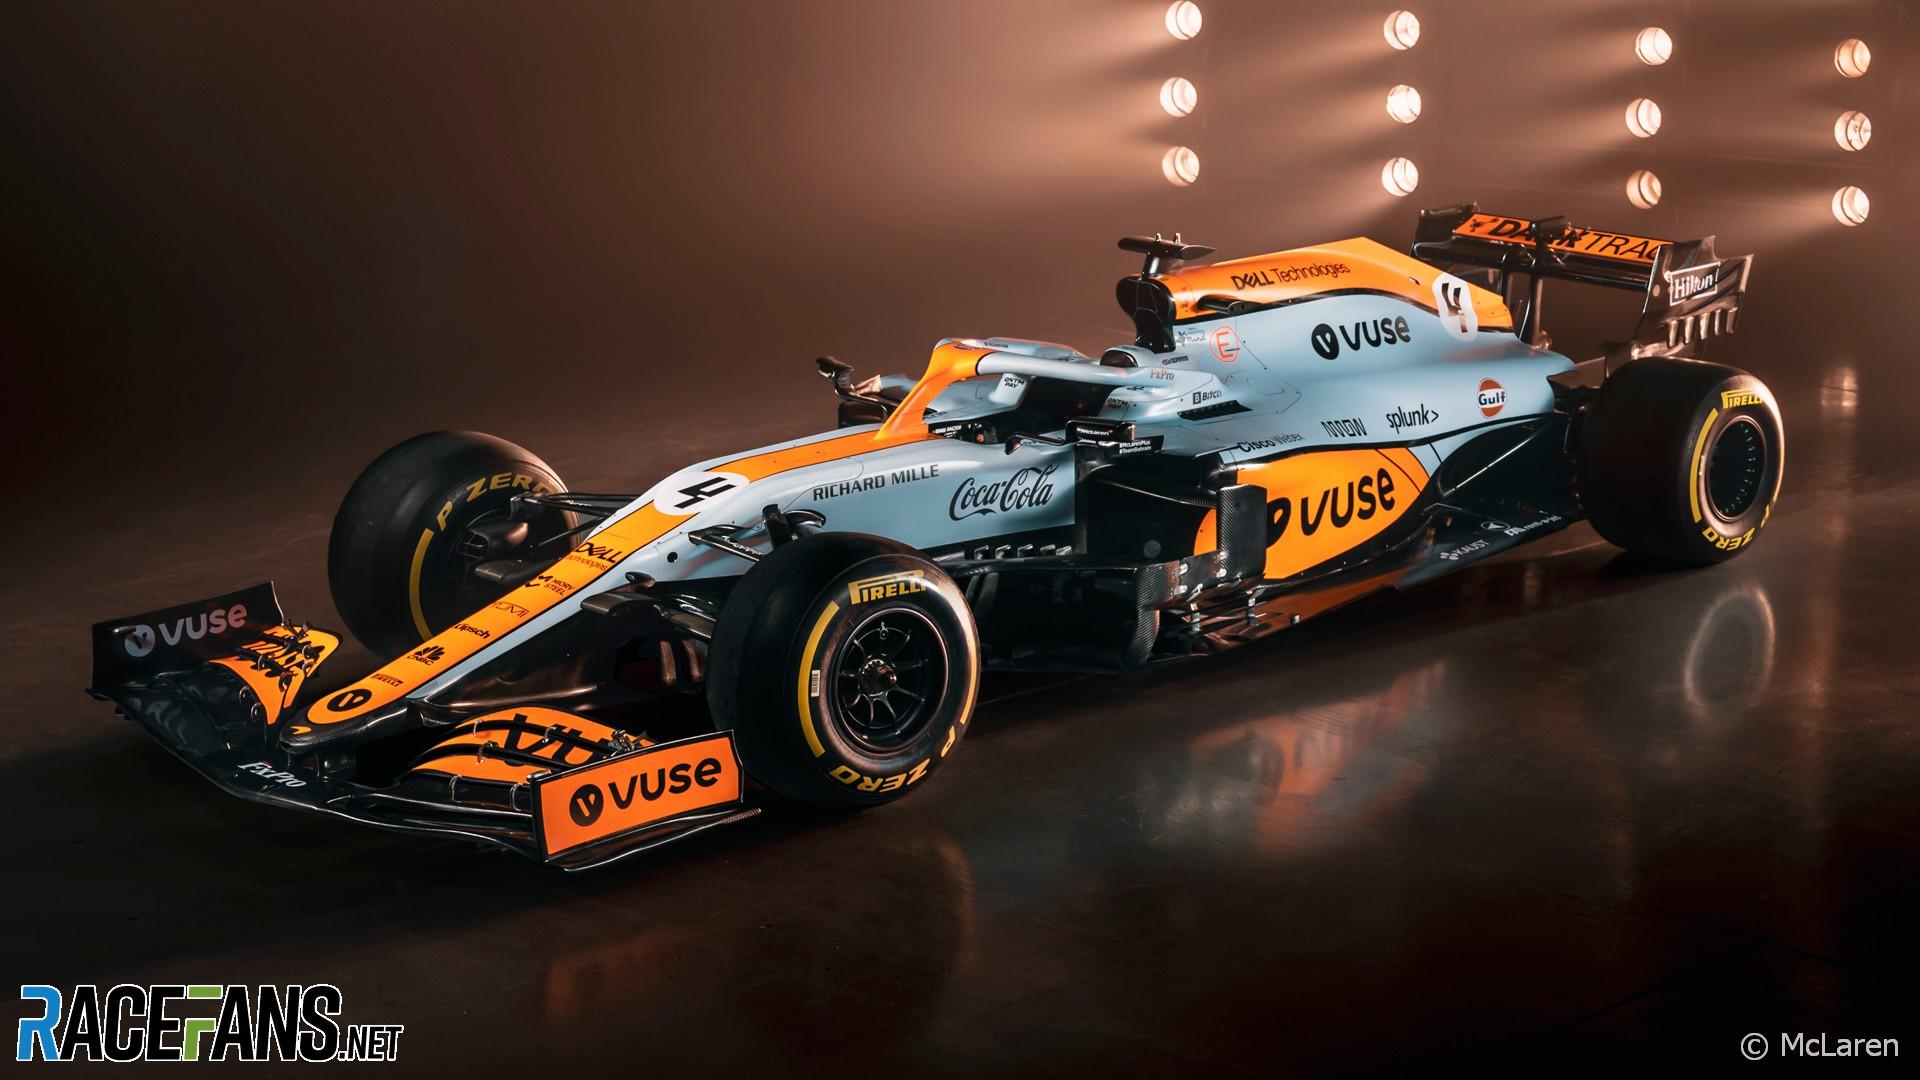 McLaren Monaco Grand Prix livery, 2021